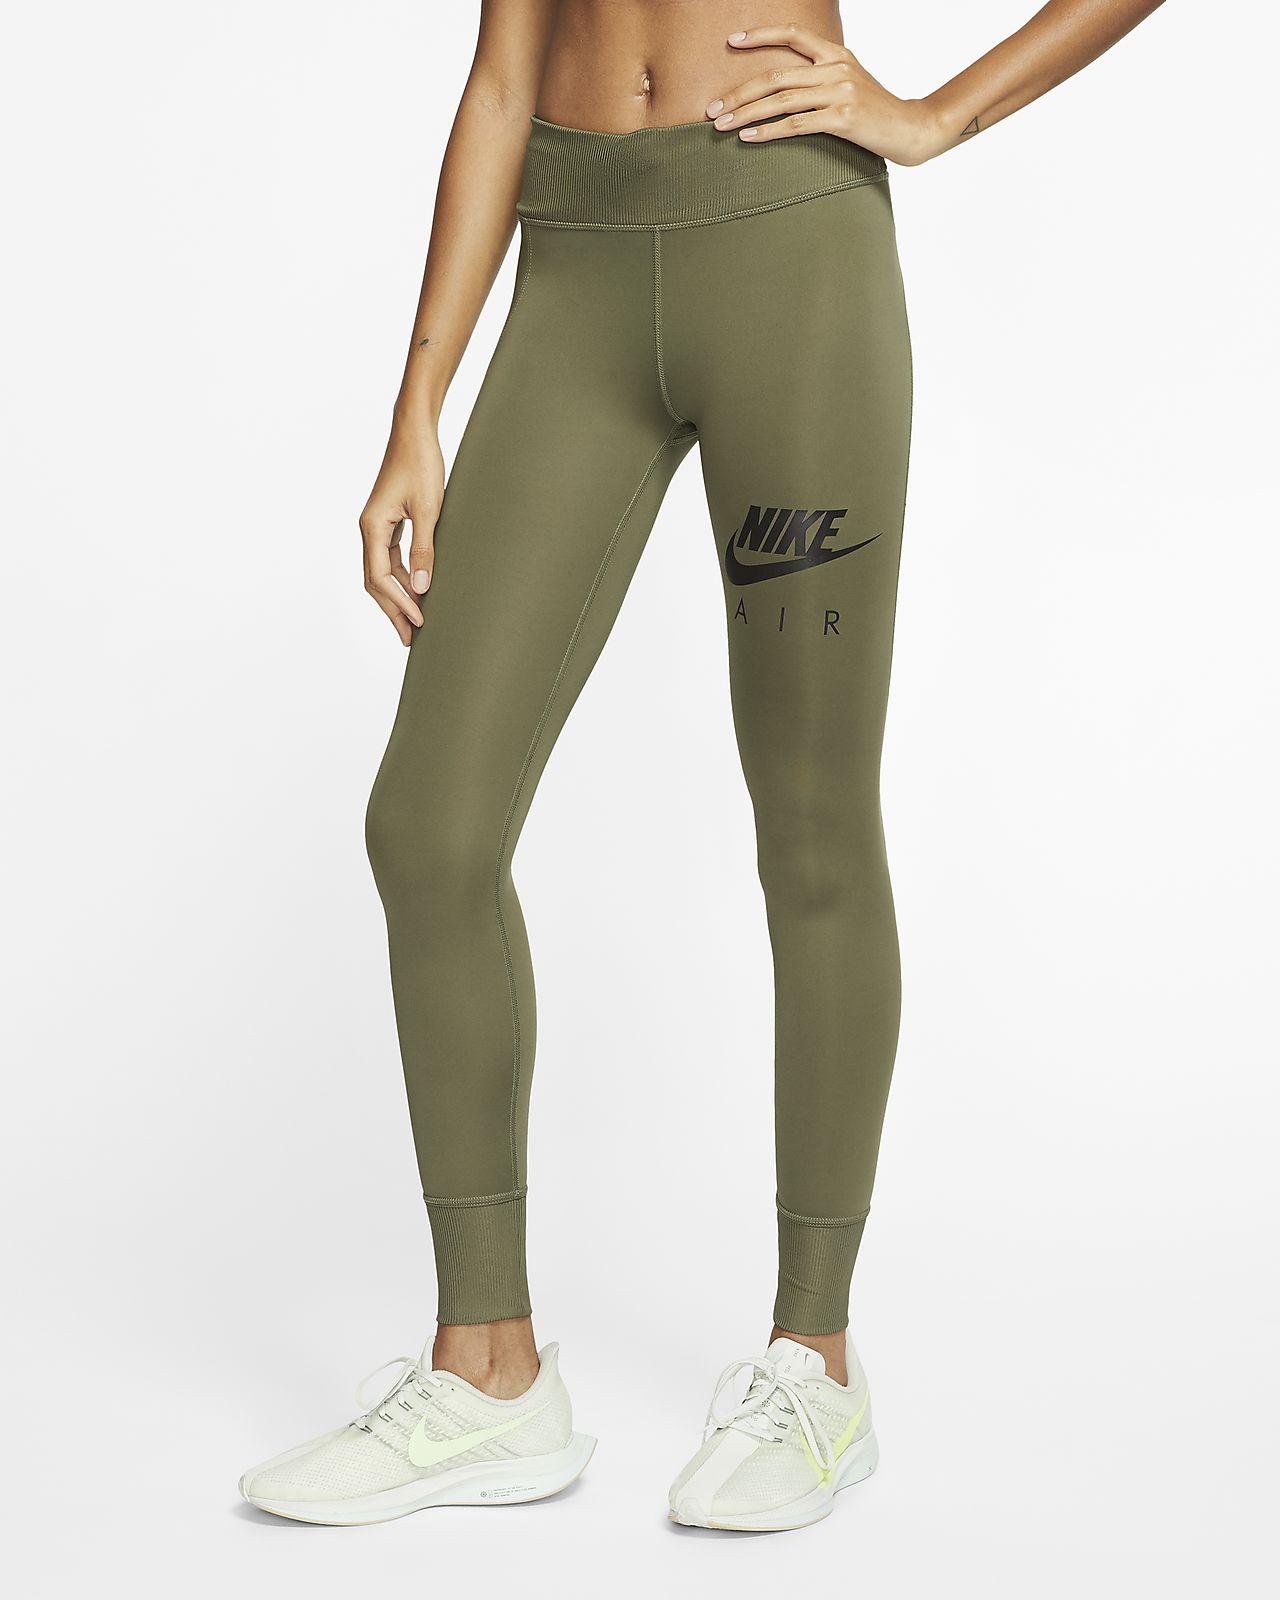 Tights de running a 7/8 Nike Fast para mulher